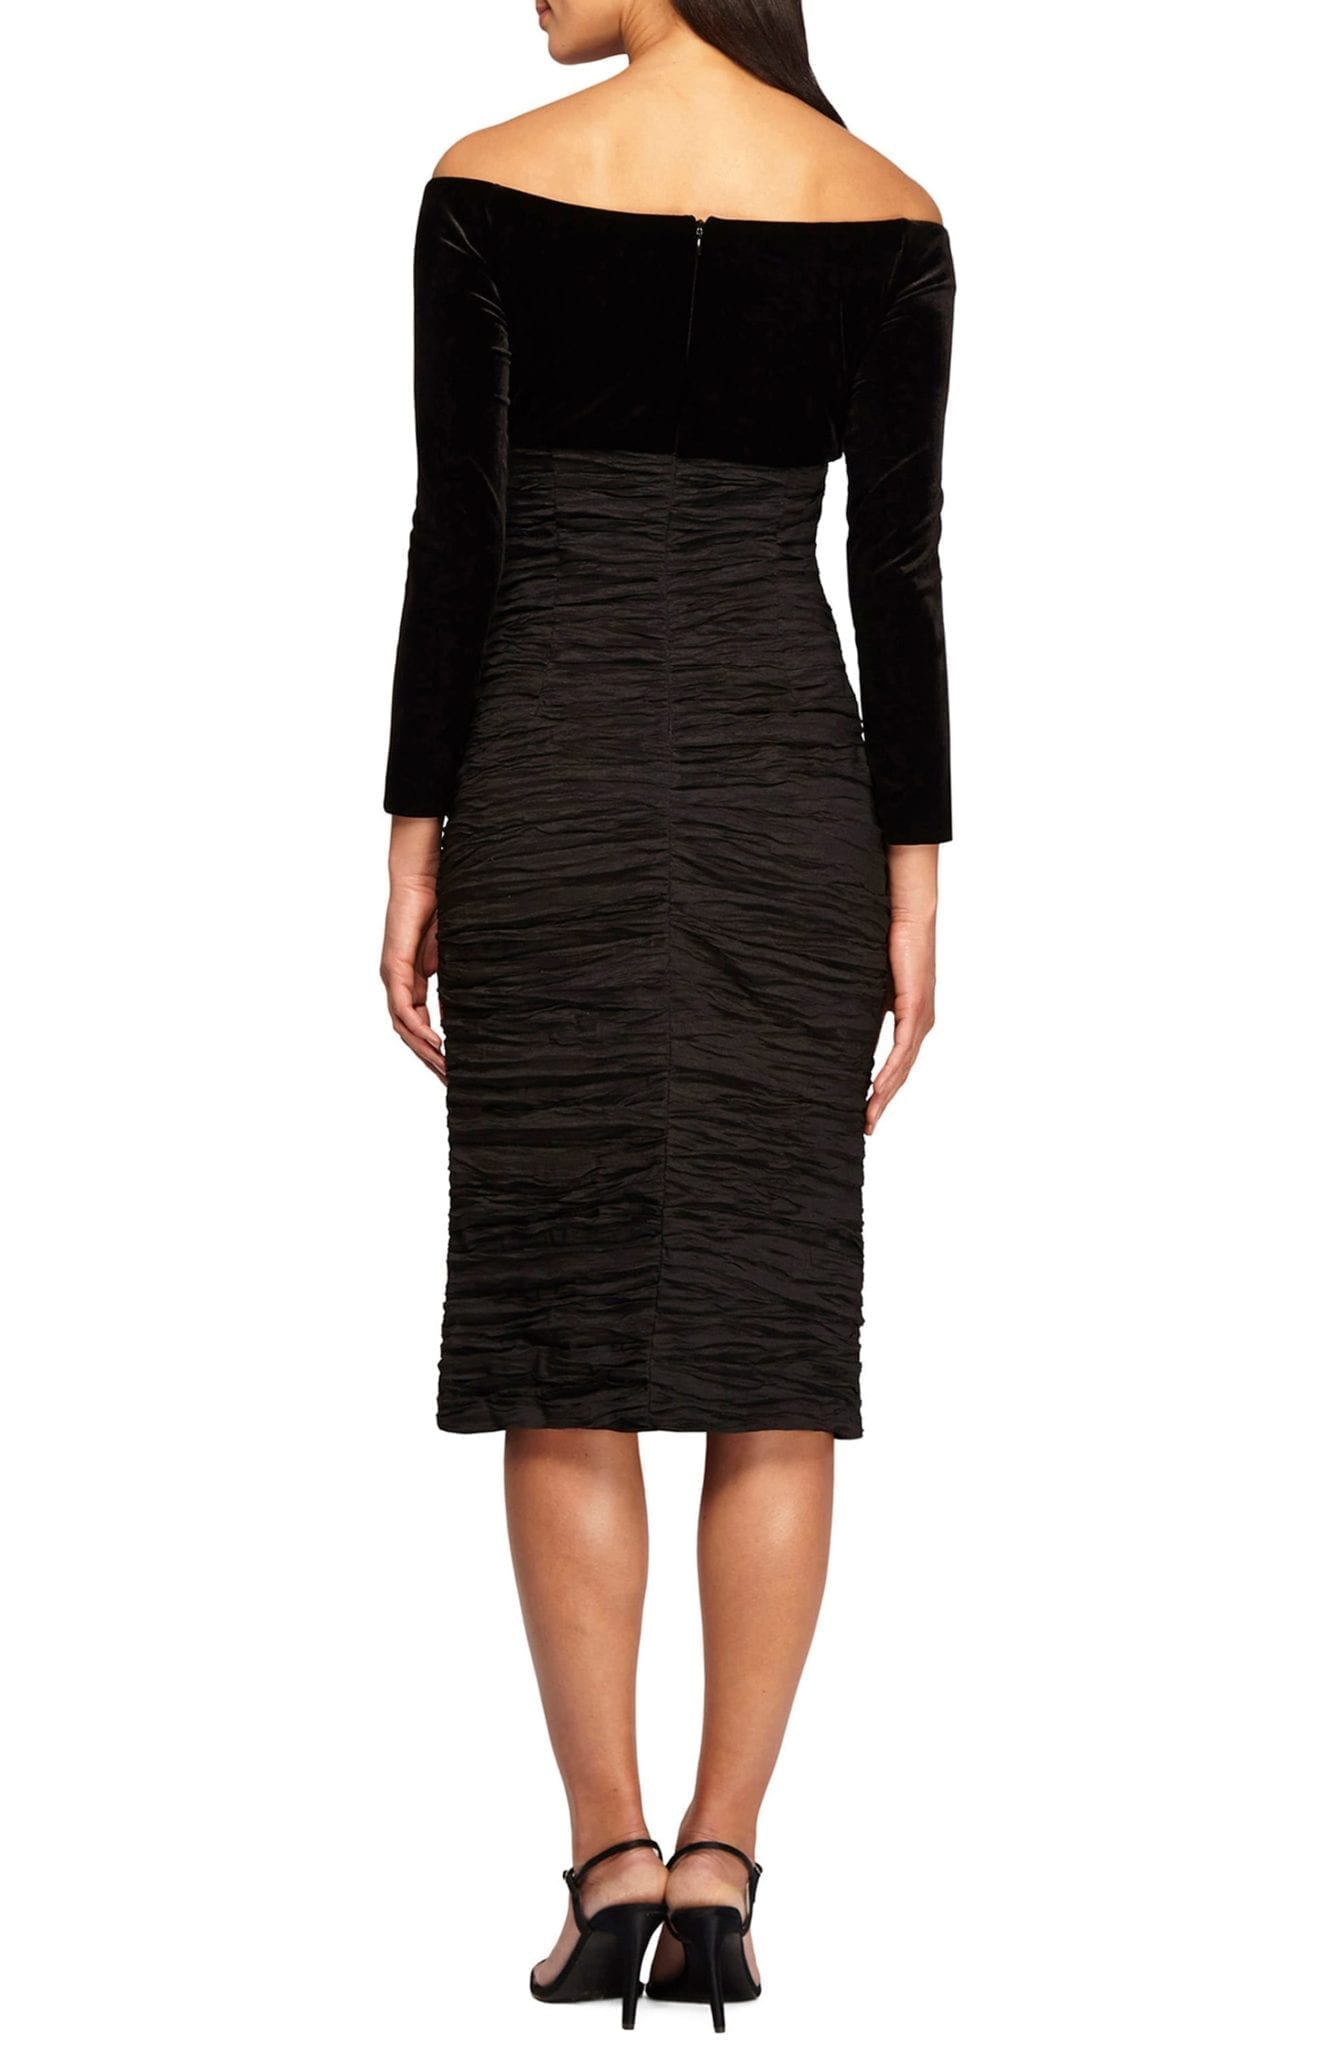 ALEX EVENINGS Off-the Shoulder Empire Waist Black Dress - We Select ...